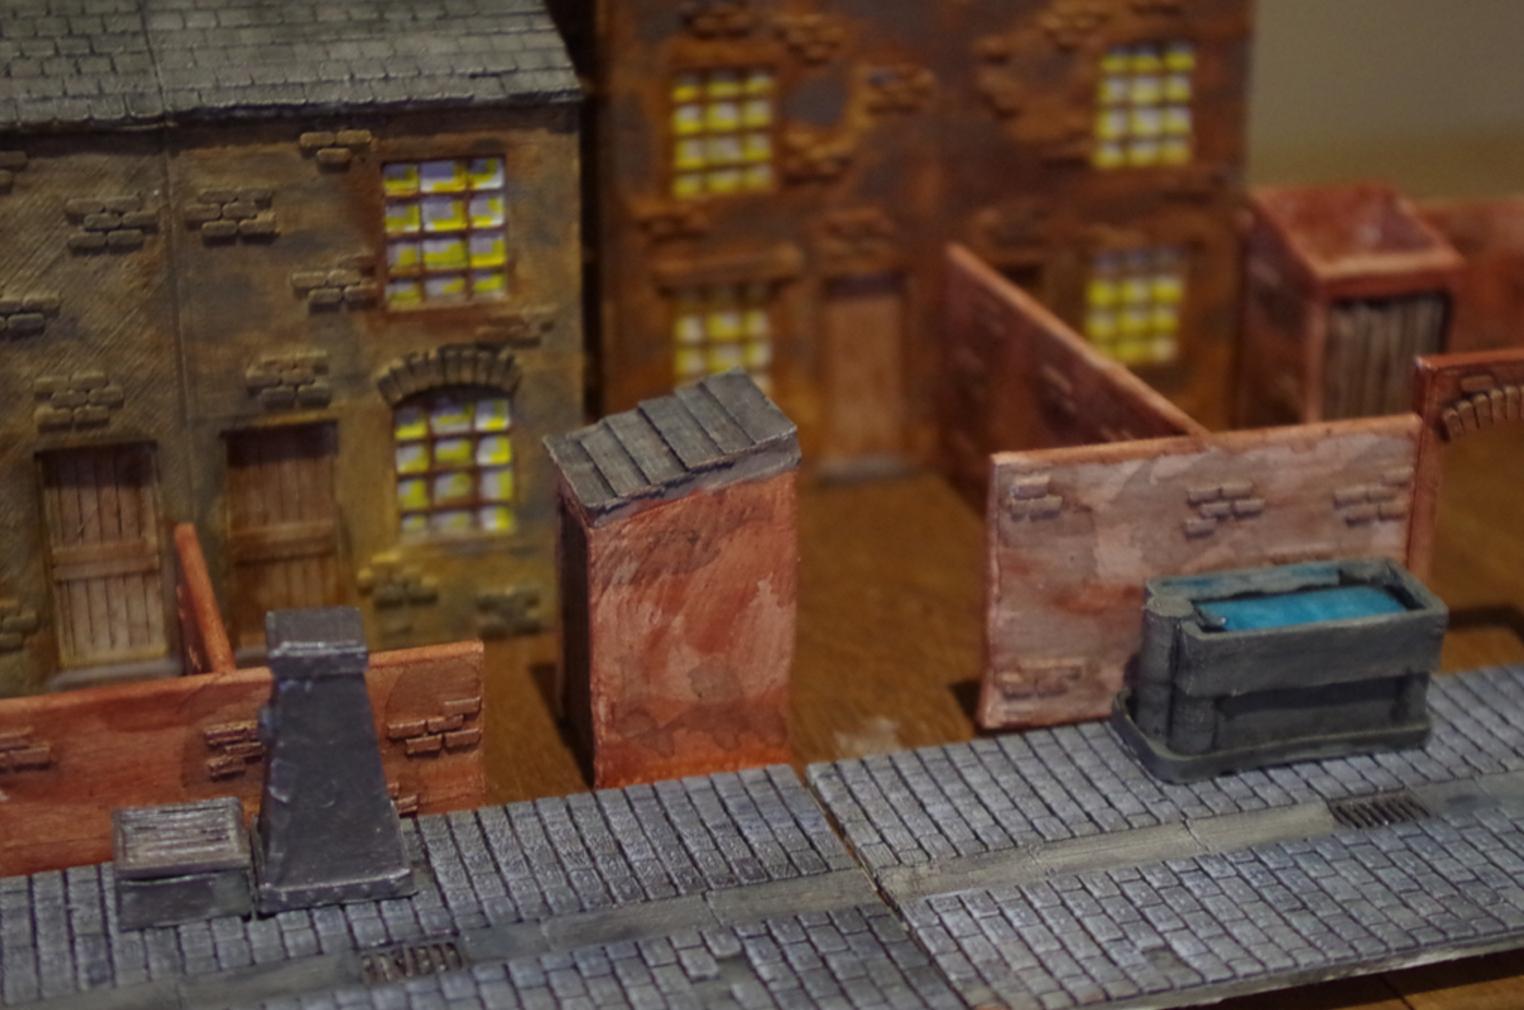 Capture d'écran 2017-09-12 à 15.33.33.png Download free STL file Ripper's London - Street Accessories • 3D printing model, Earsling